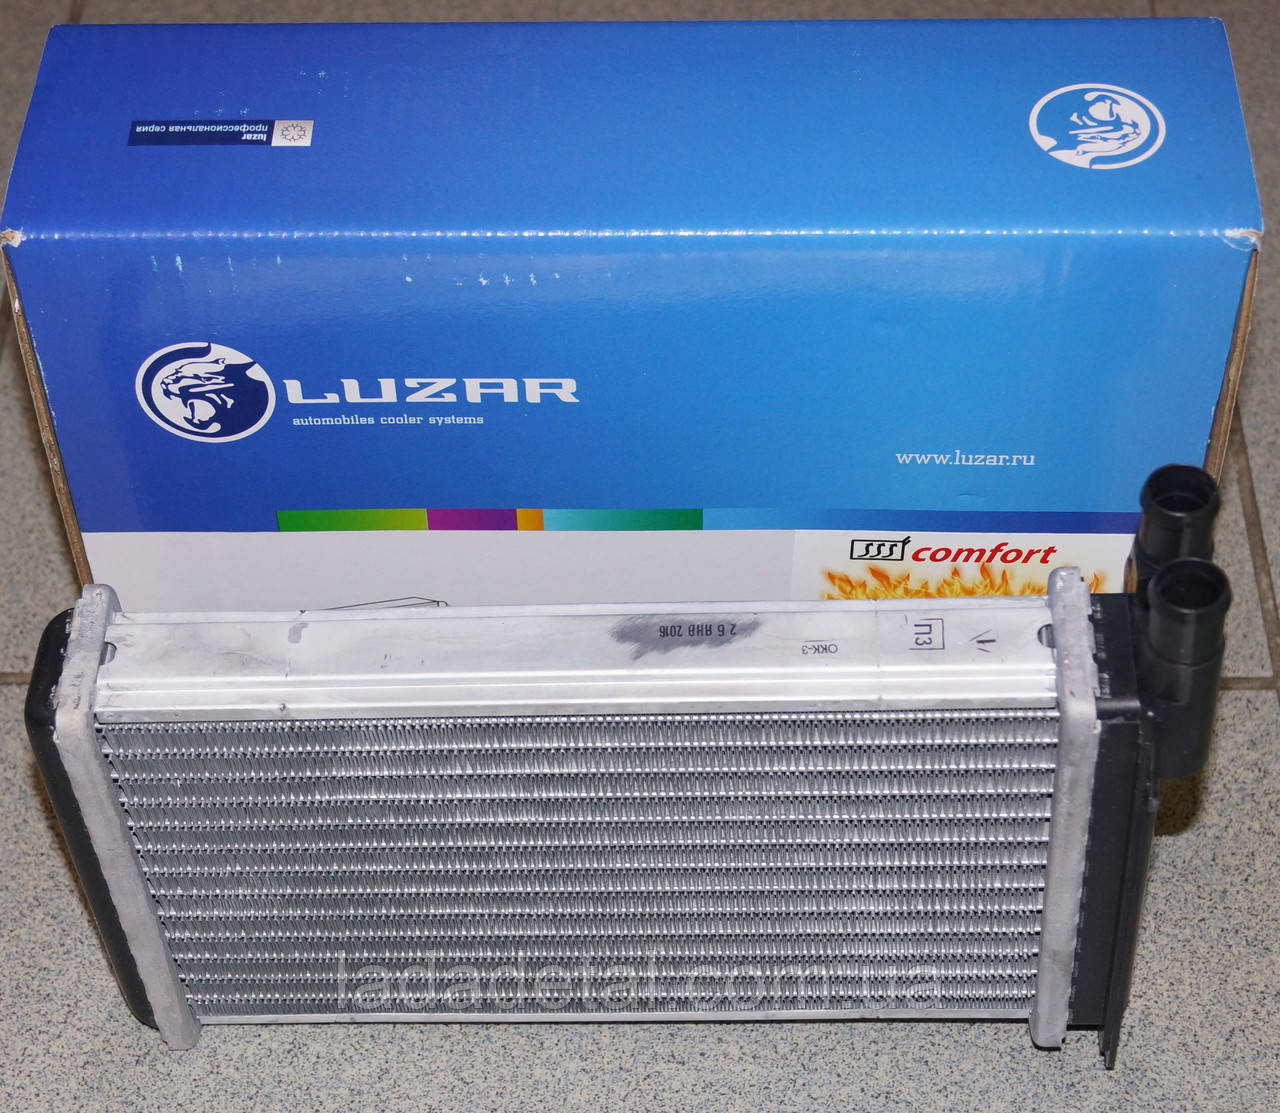 Радиатор печки (печка)  ВАЗ 2108, 2109, 21099, 2113, 2114, 2115 Лузар Comfort